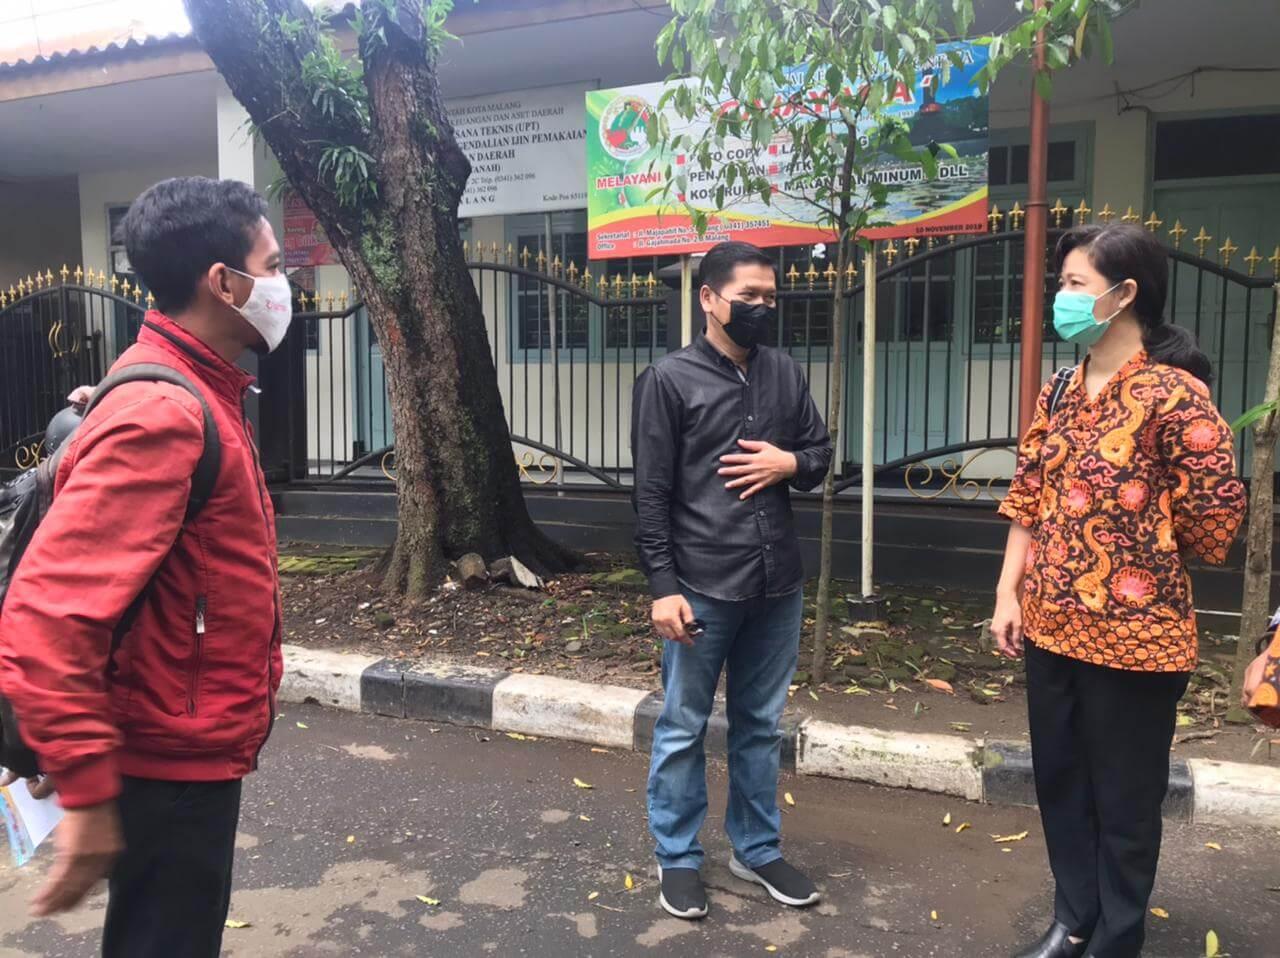 Kepala Dinkes Kota Malang Husnul Muarif (tengah) saat survei lokasi vaksinasi drive thru bersama perwakilan aplikasi Halodoc Sabtu (20/3/2021). (Foto: Istimewa/Tugu Jatim)